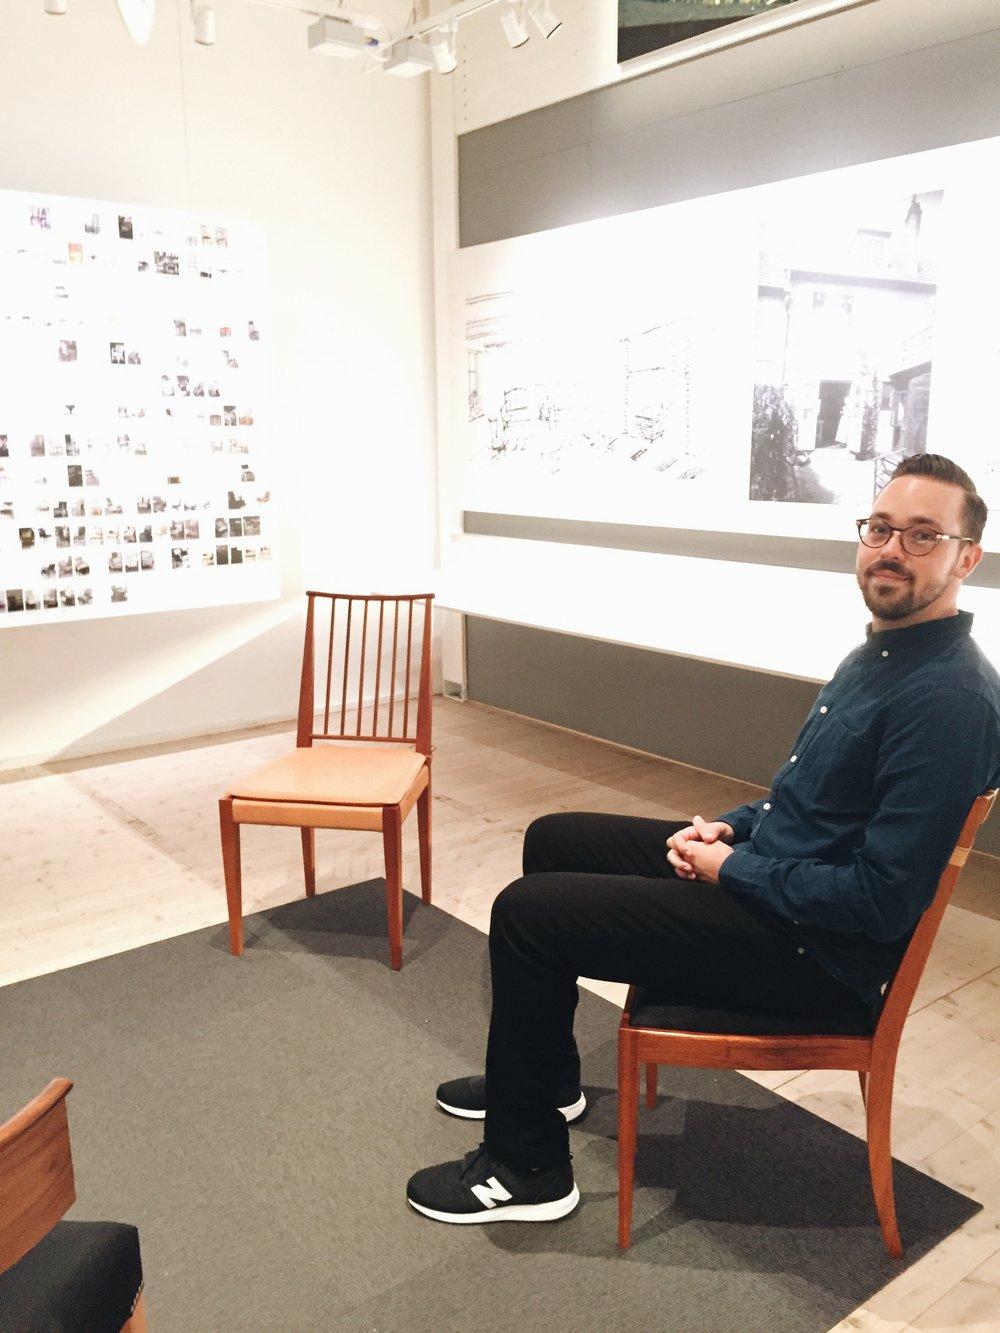 Scott testing Scandinavian furniture at the Josef Frank exhibit.